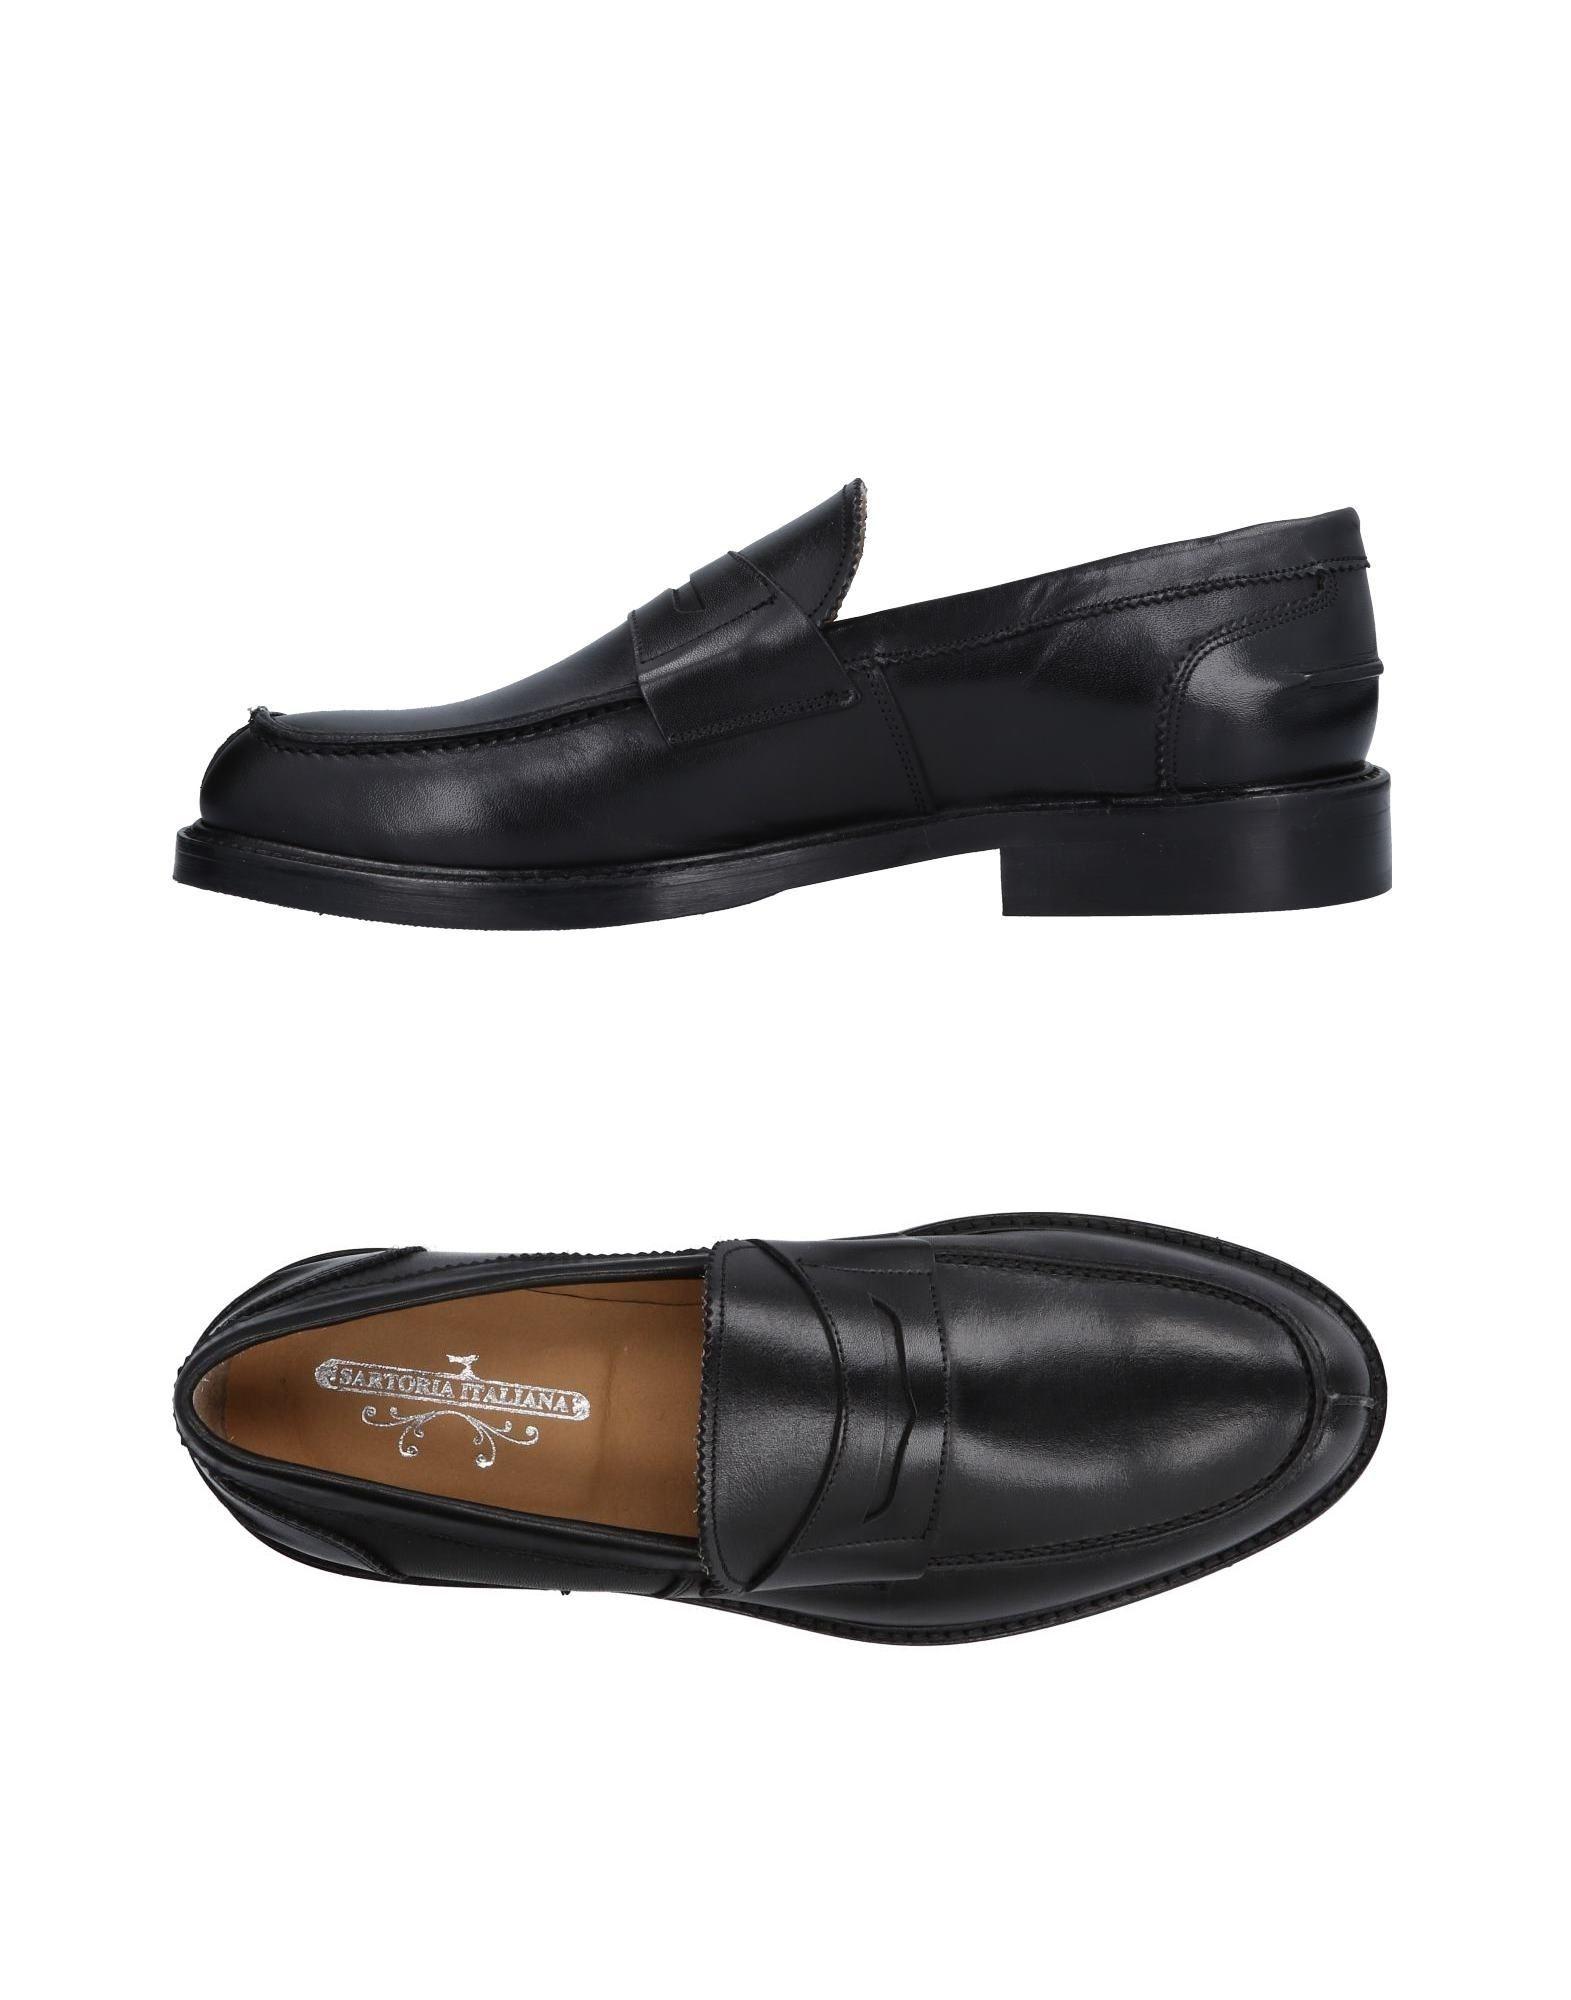 Sartoria Italiana Mokassins Herren  11498201VJ Gute Qualität beliebte Schuhe